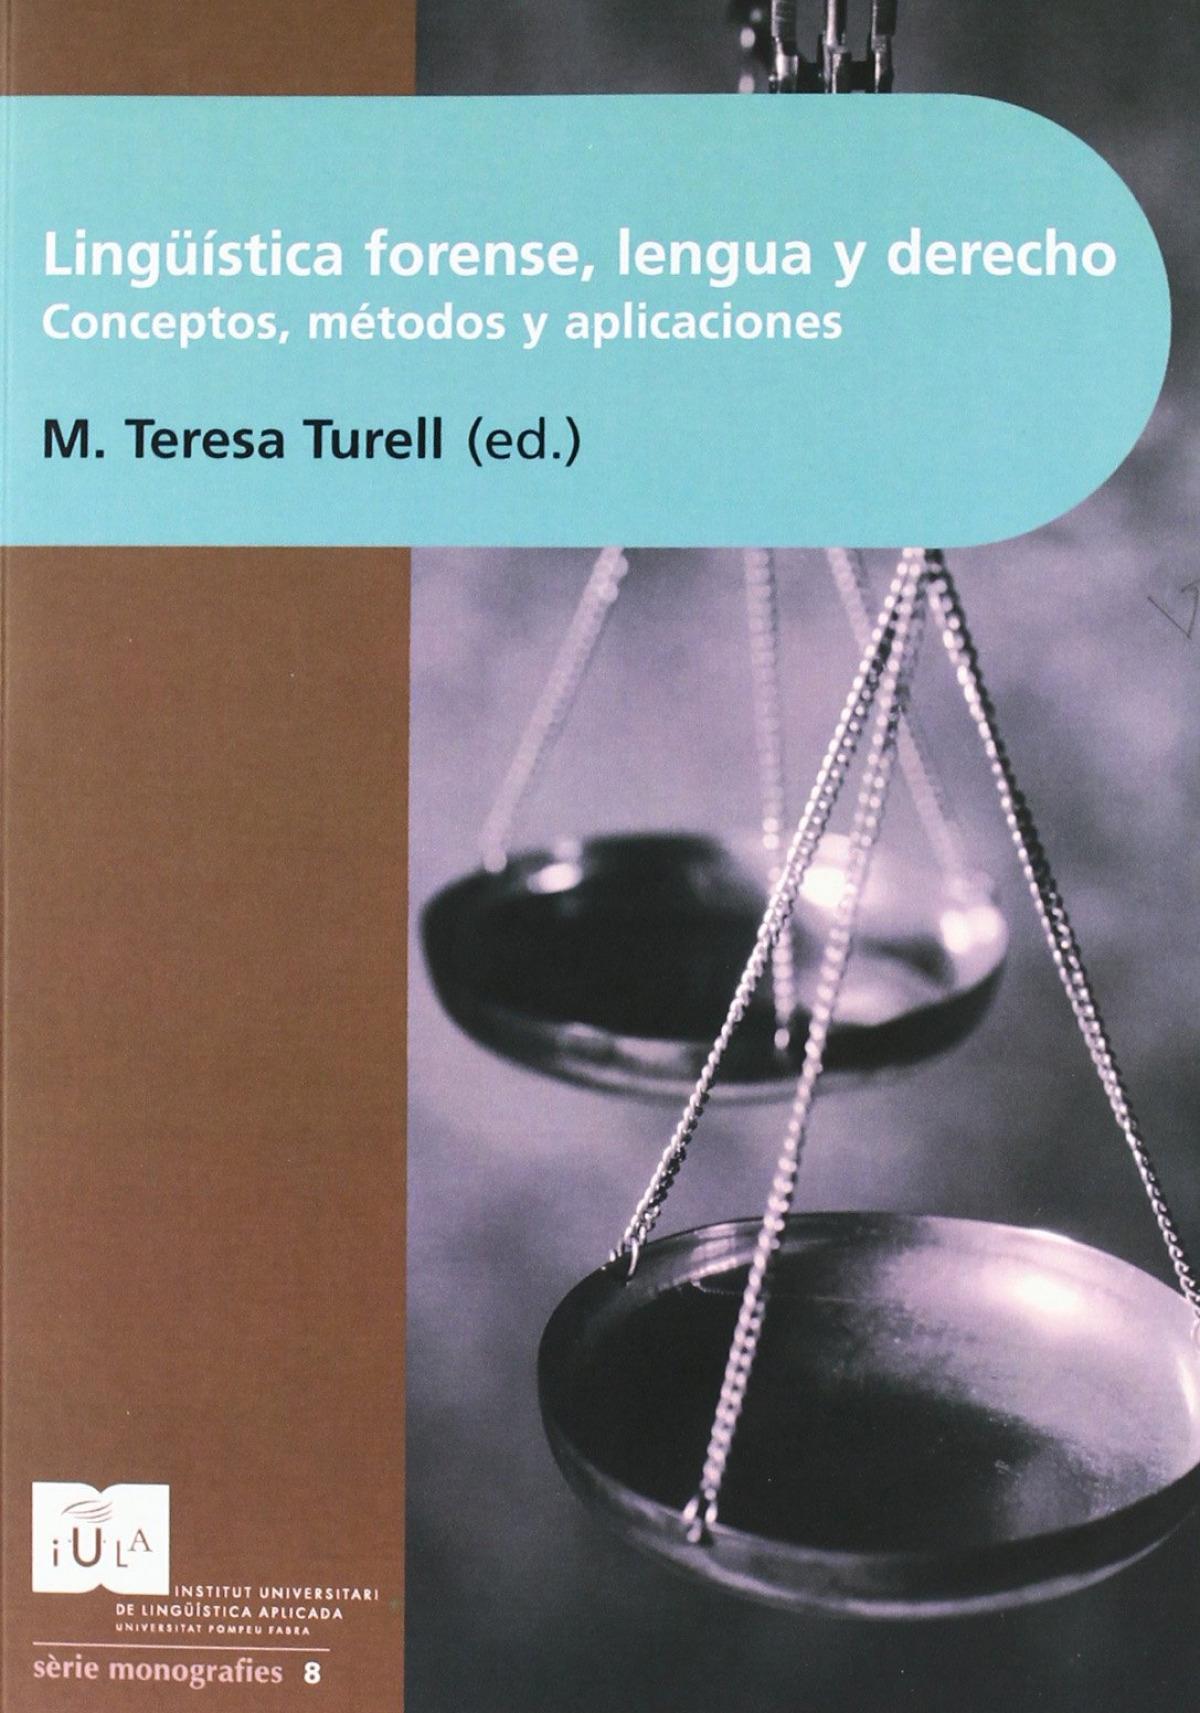 Lingüistica forense 9788493468538